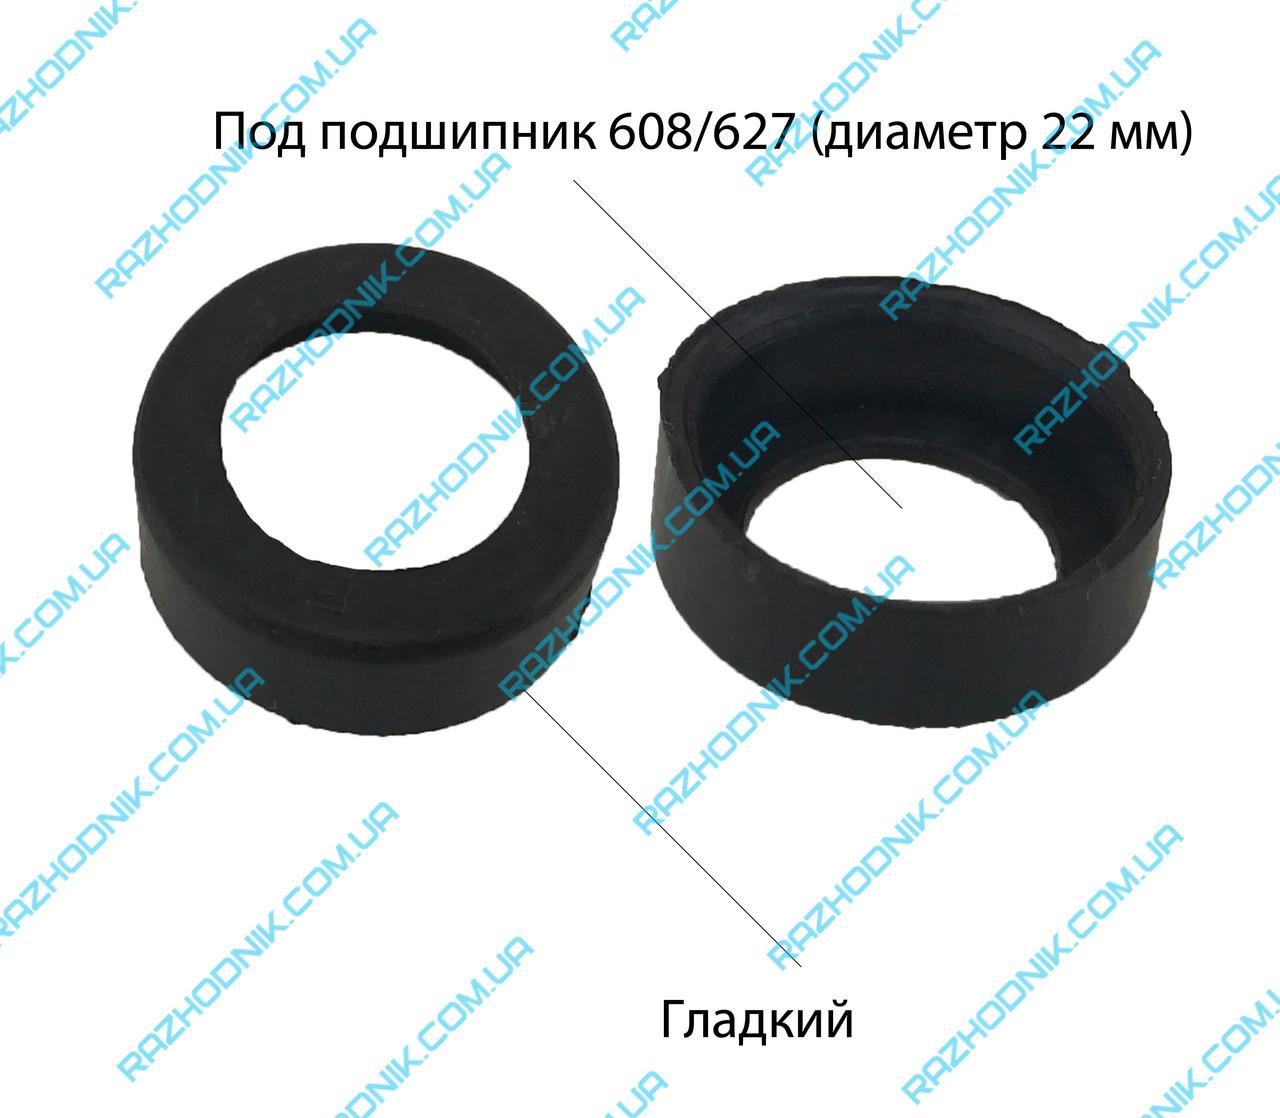 Амортизатор подшипника  608/627 (гладкий)